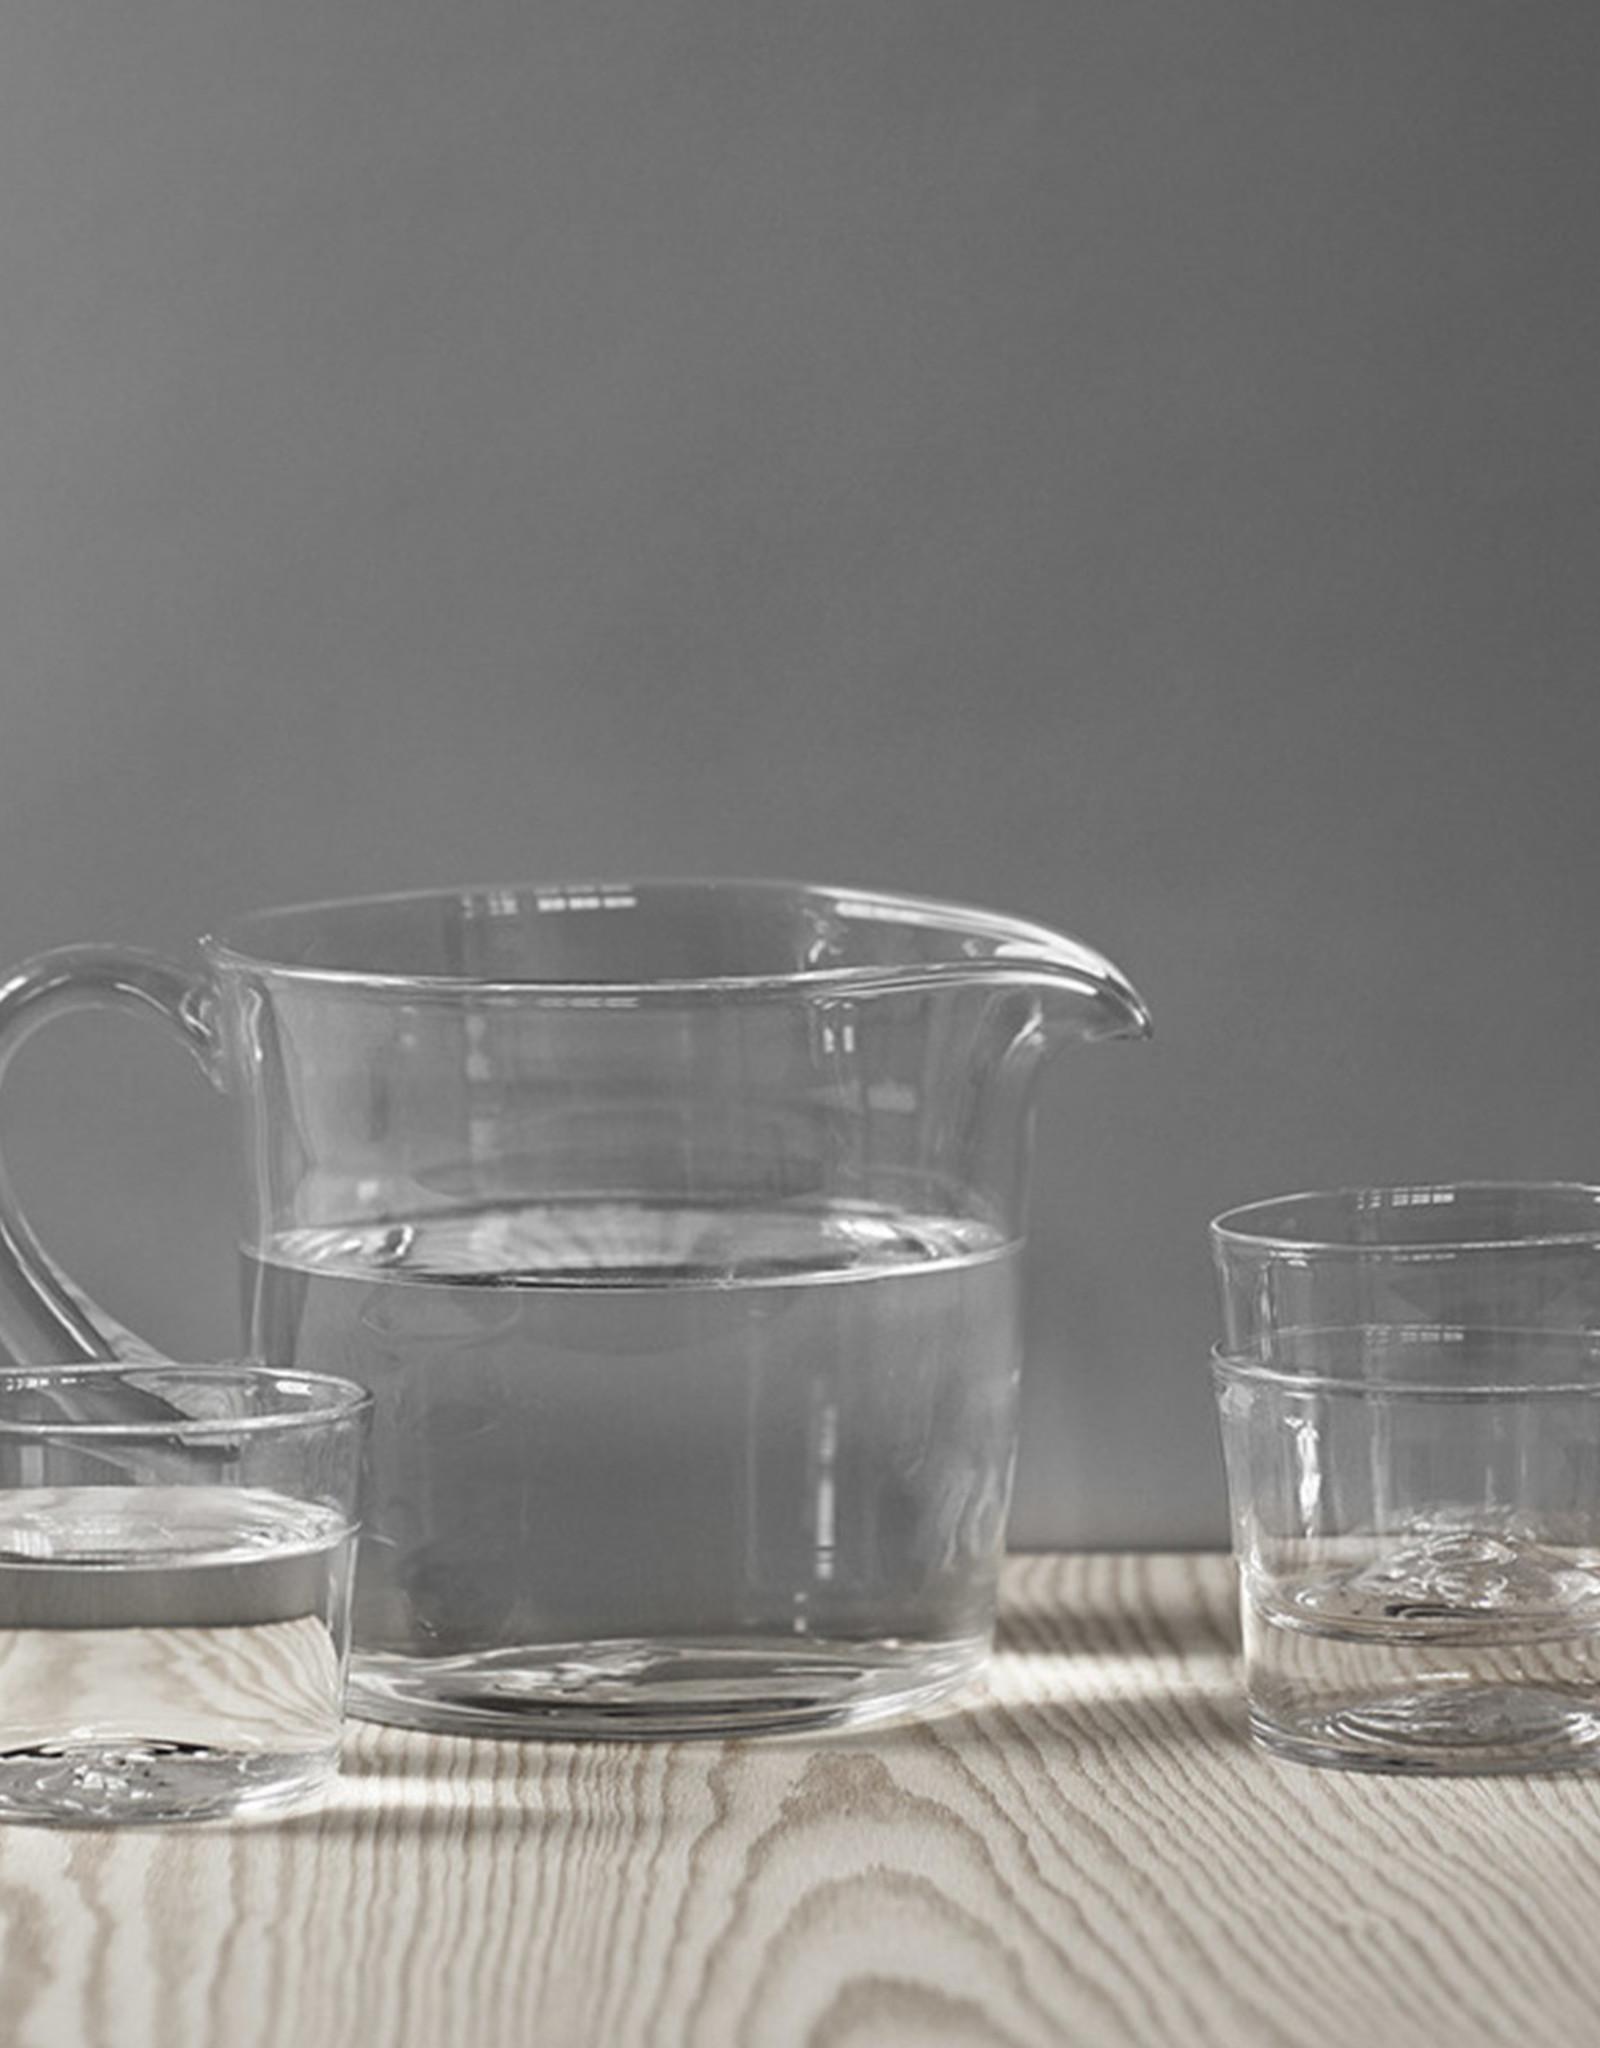 Vases Balja Tub jug by Carina Seth Andersson | Large |150cl